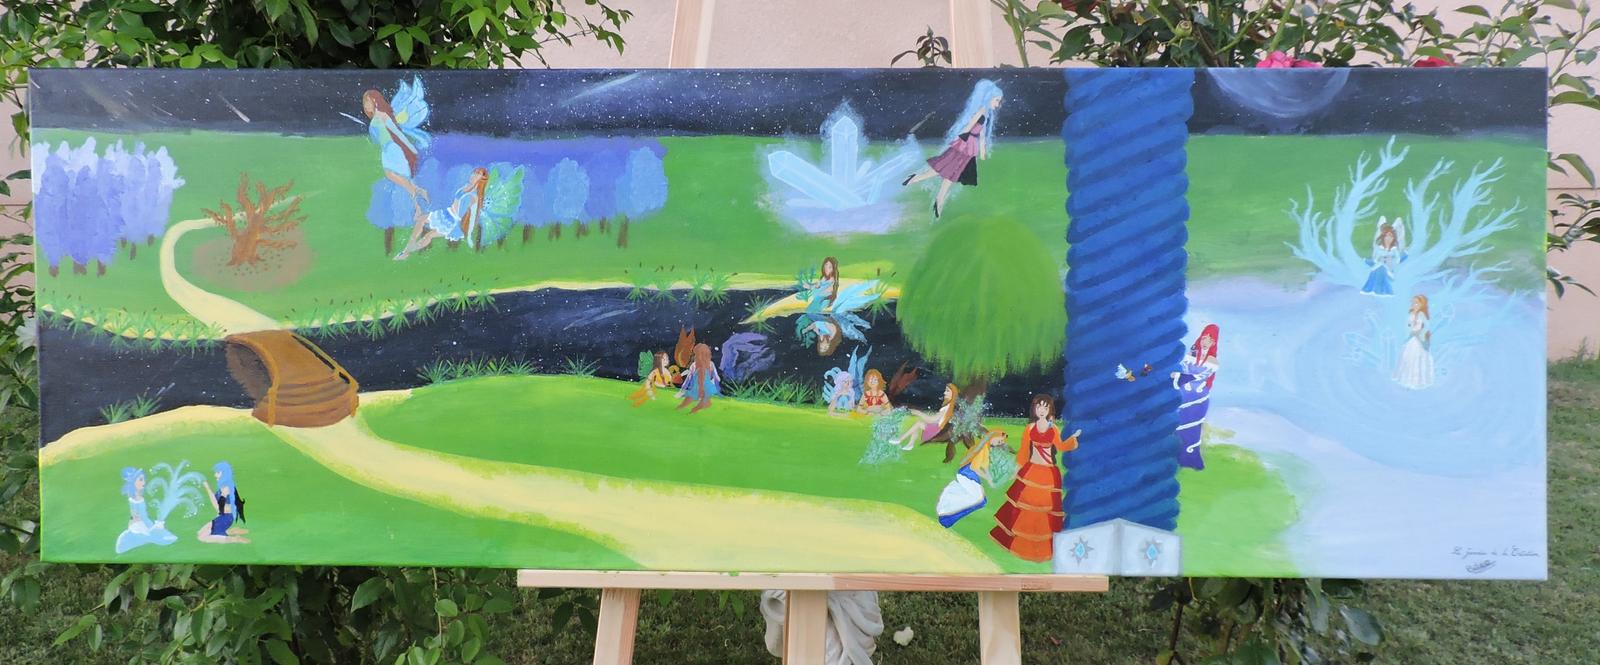 Le jardin de la creation by beatrice dragon team on deviantart for Art jardin creation